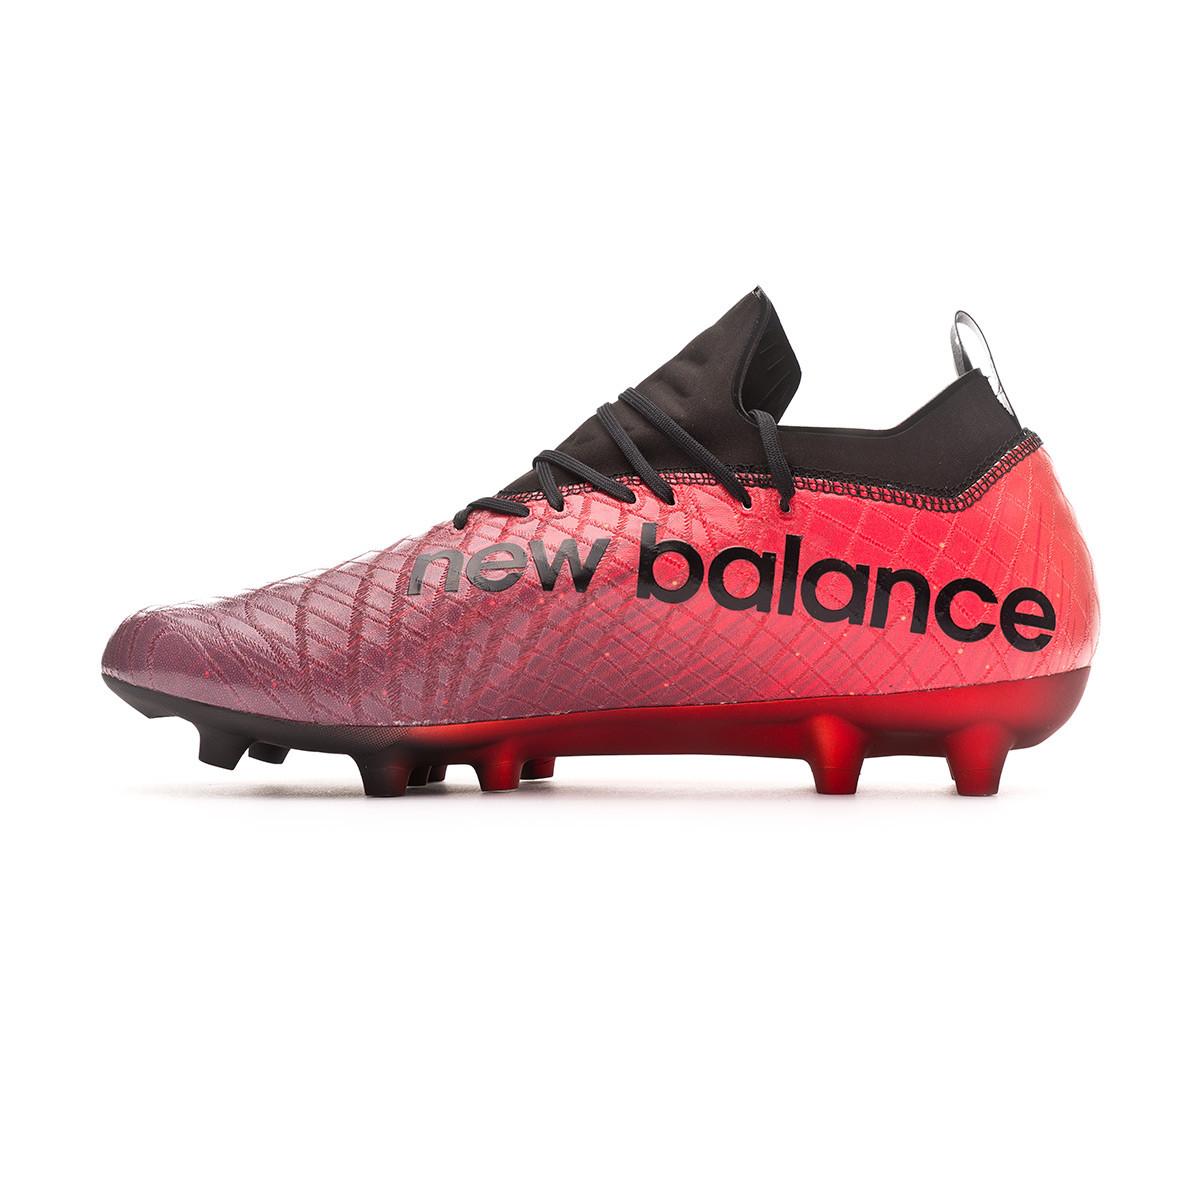 New Balance Tekela Liteshift FG Football Boots